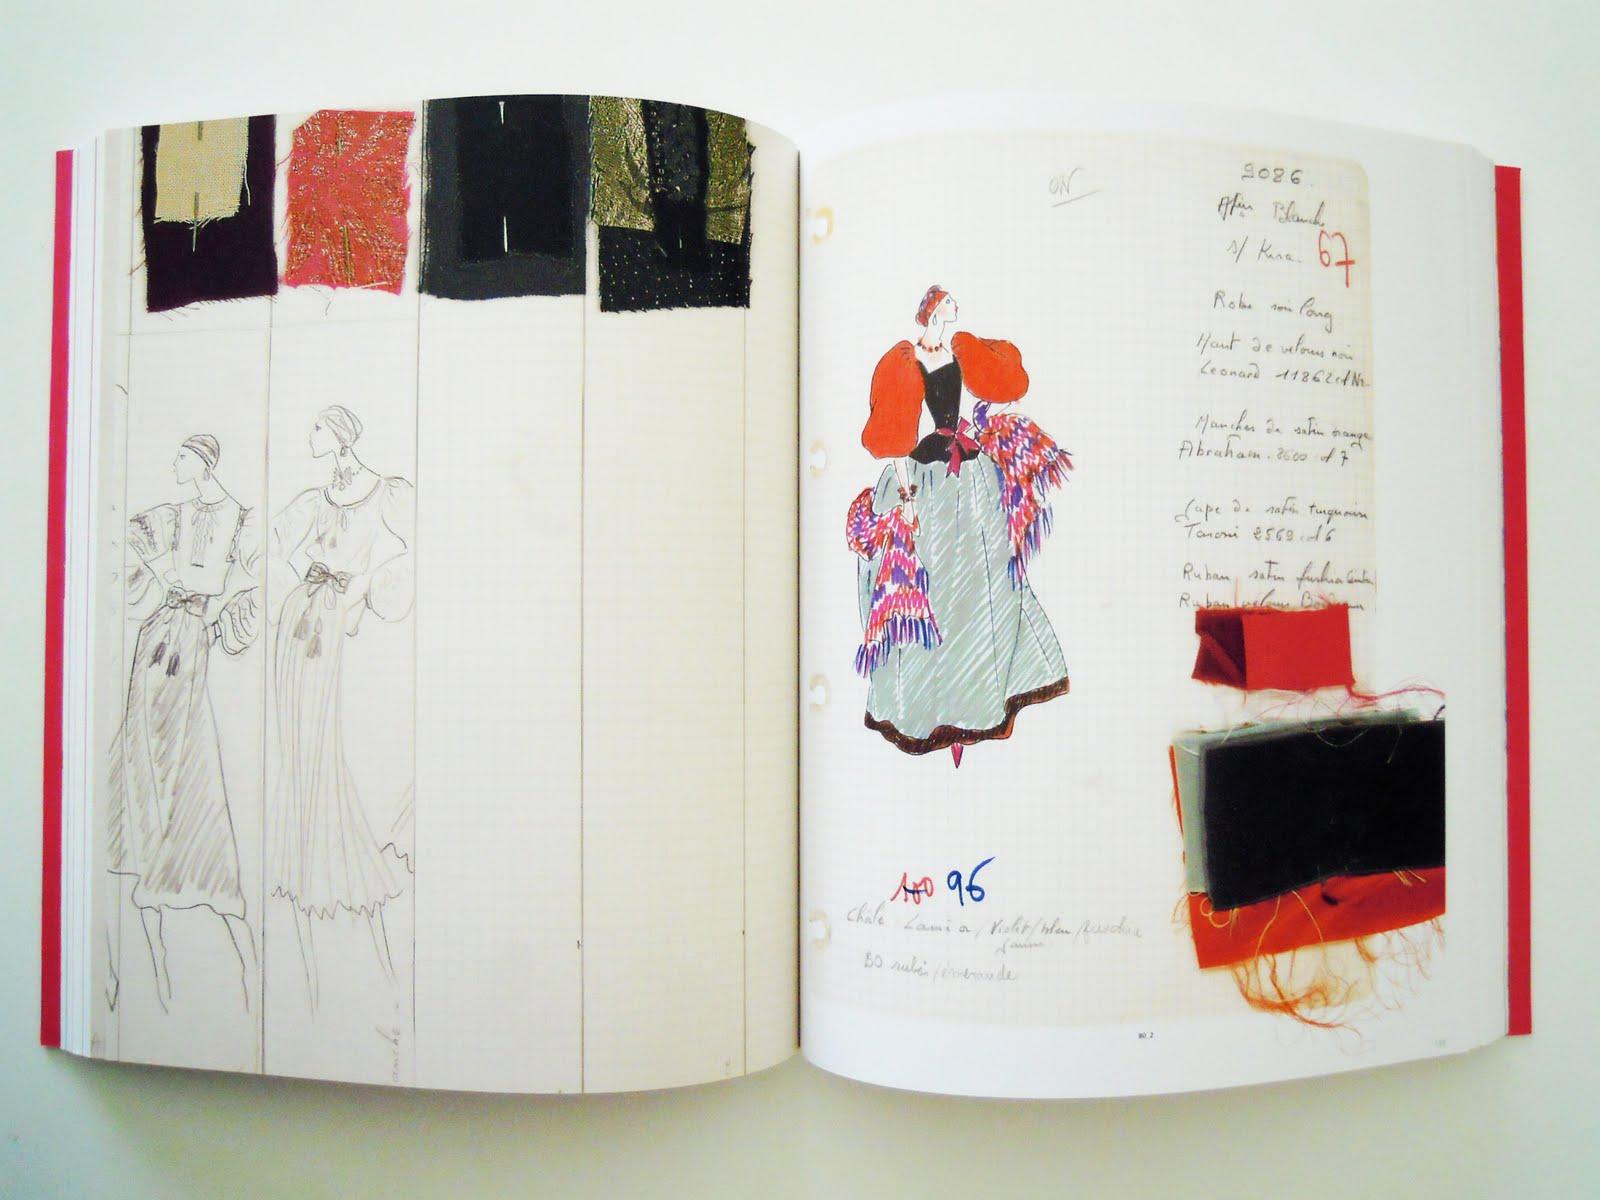 yves saint laurent style book. Black Bedroom Furniture Sets. Home Design Ideas